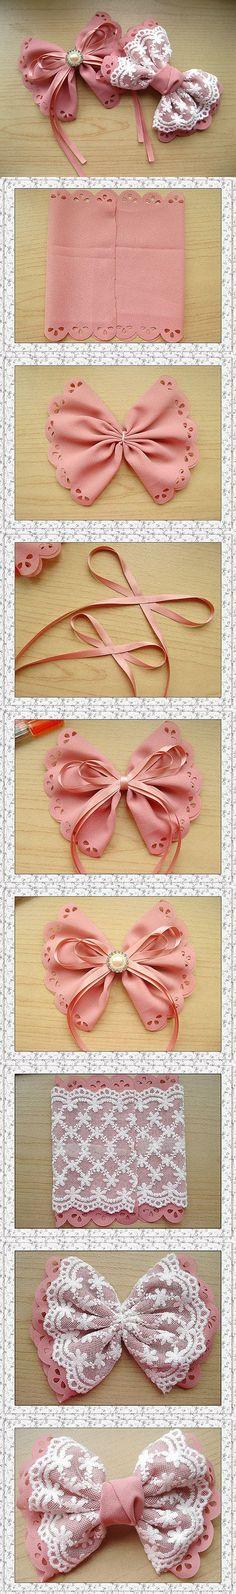 DIY craft bowknot